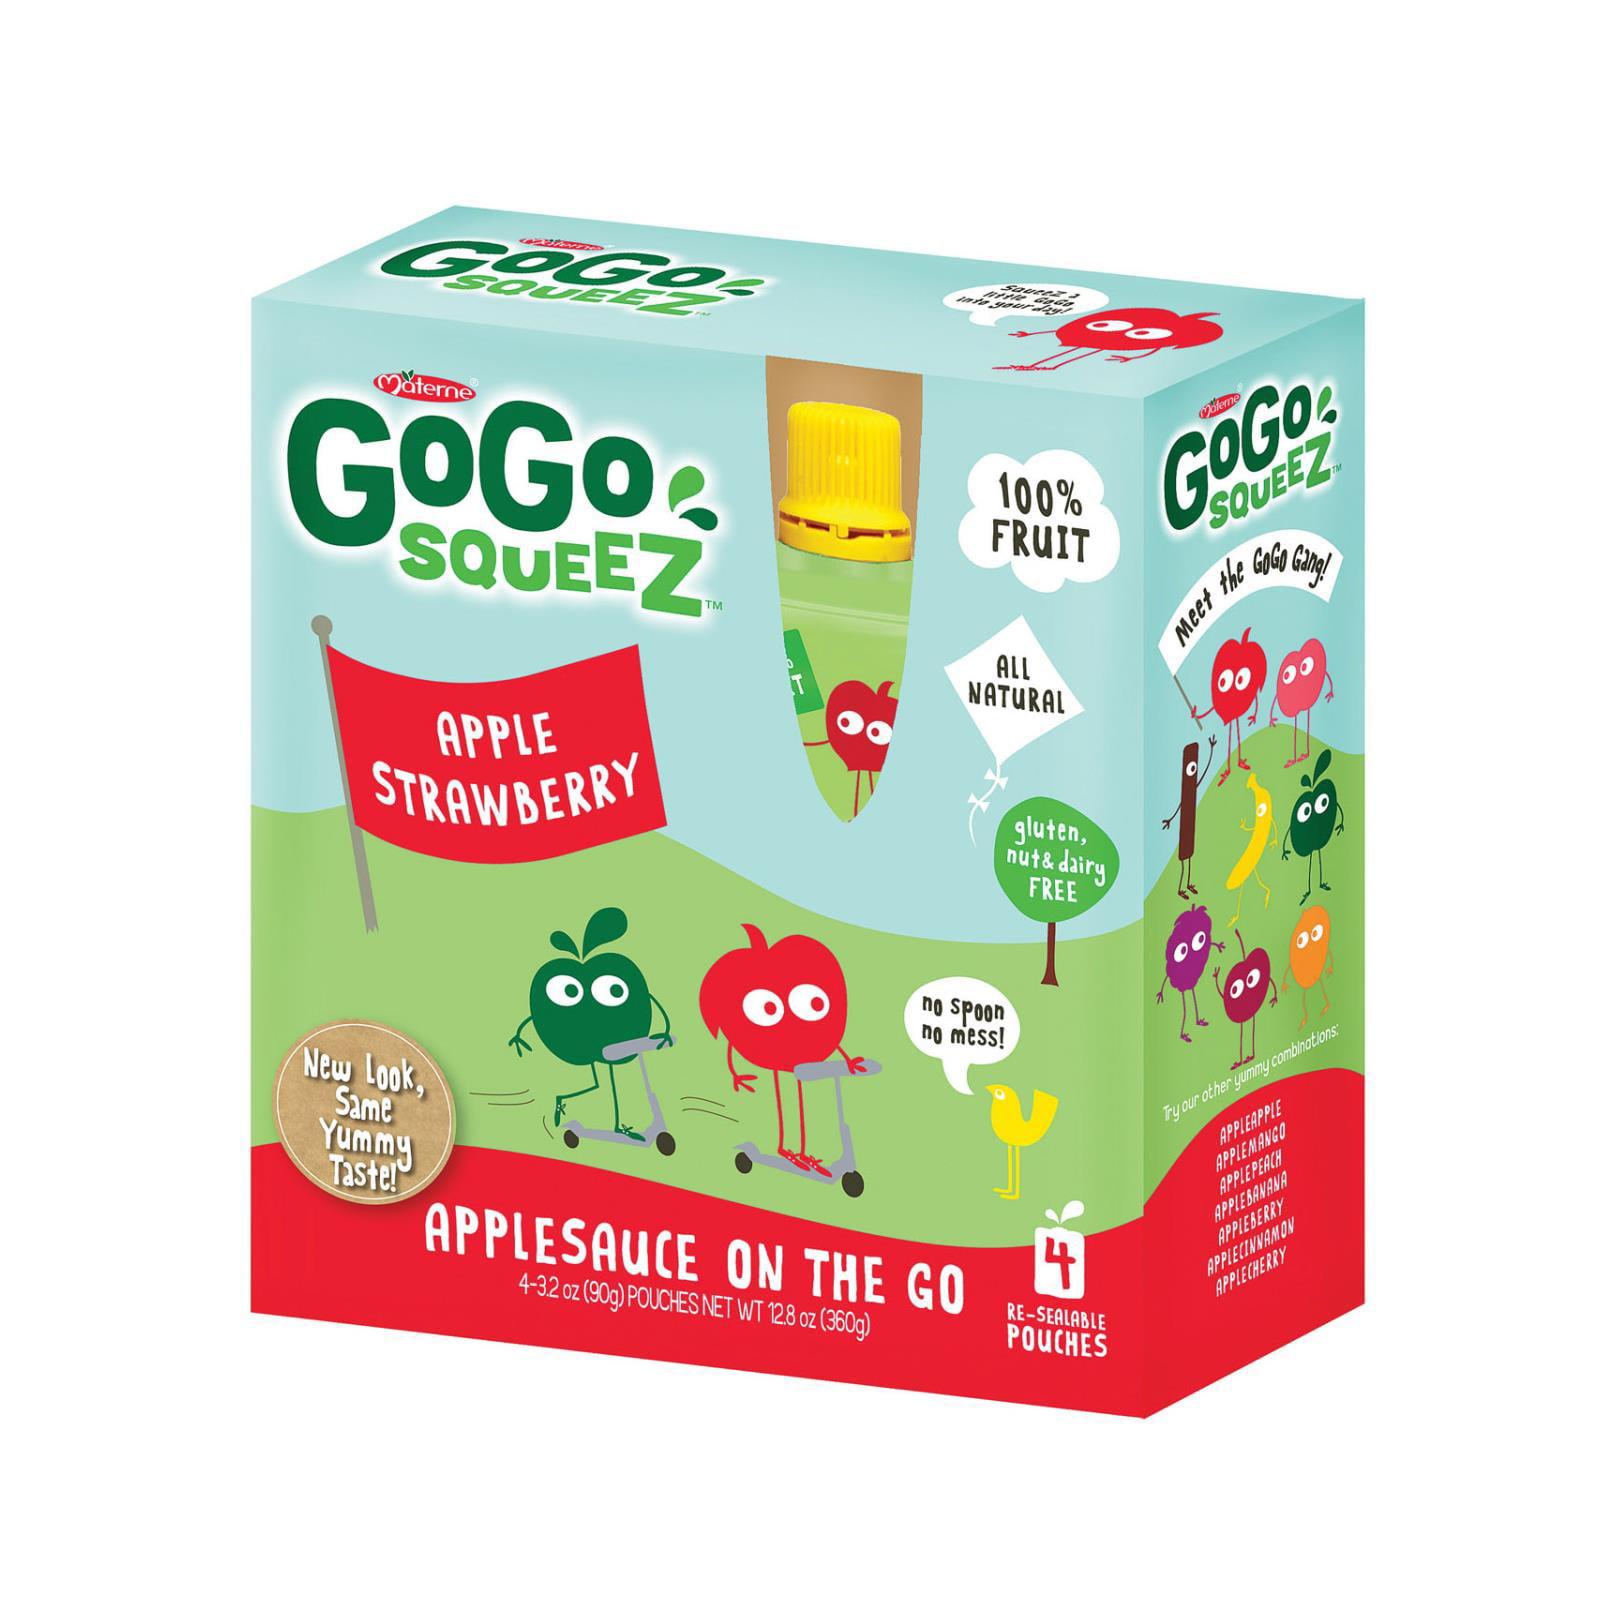 GoGo Squeeze Organic Applesauce - Apple Strawberry - Case of 12 - 3.2 oz.